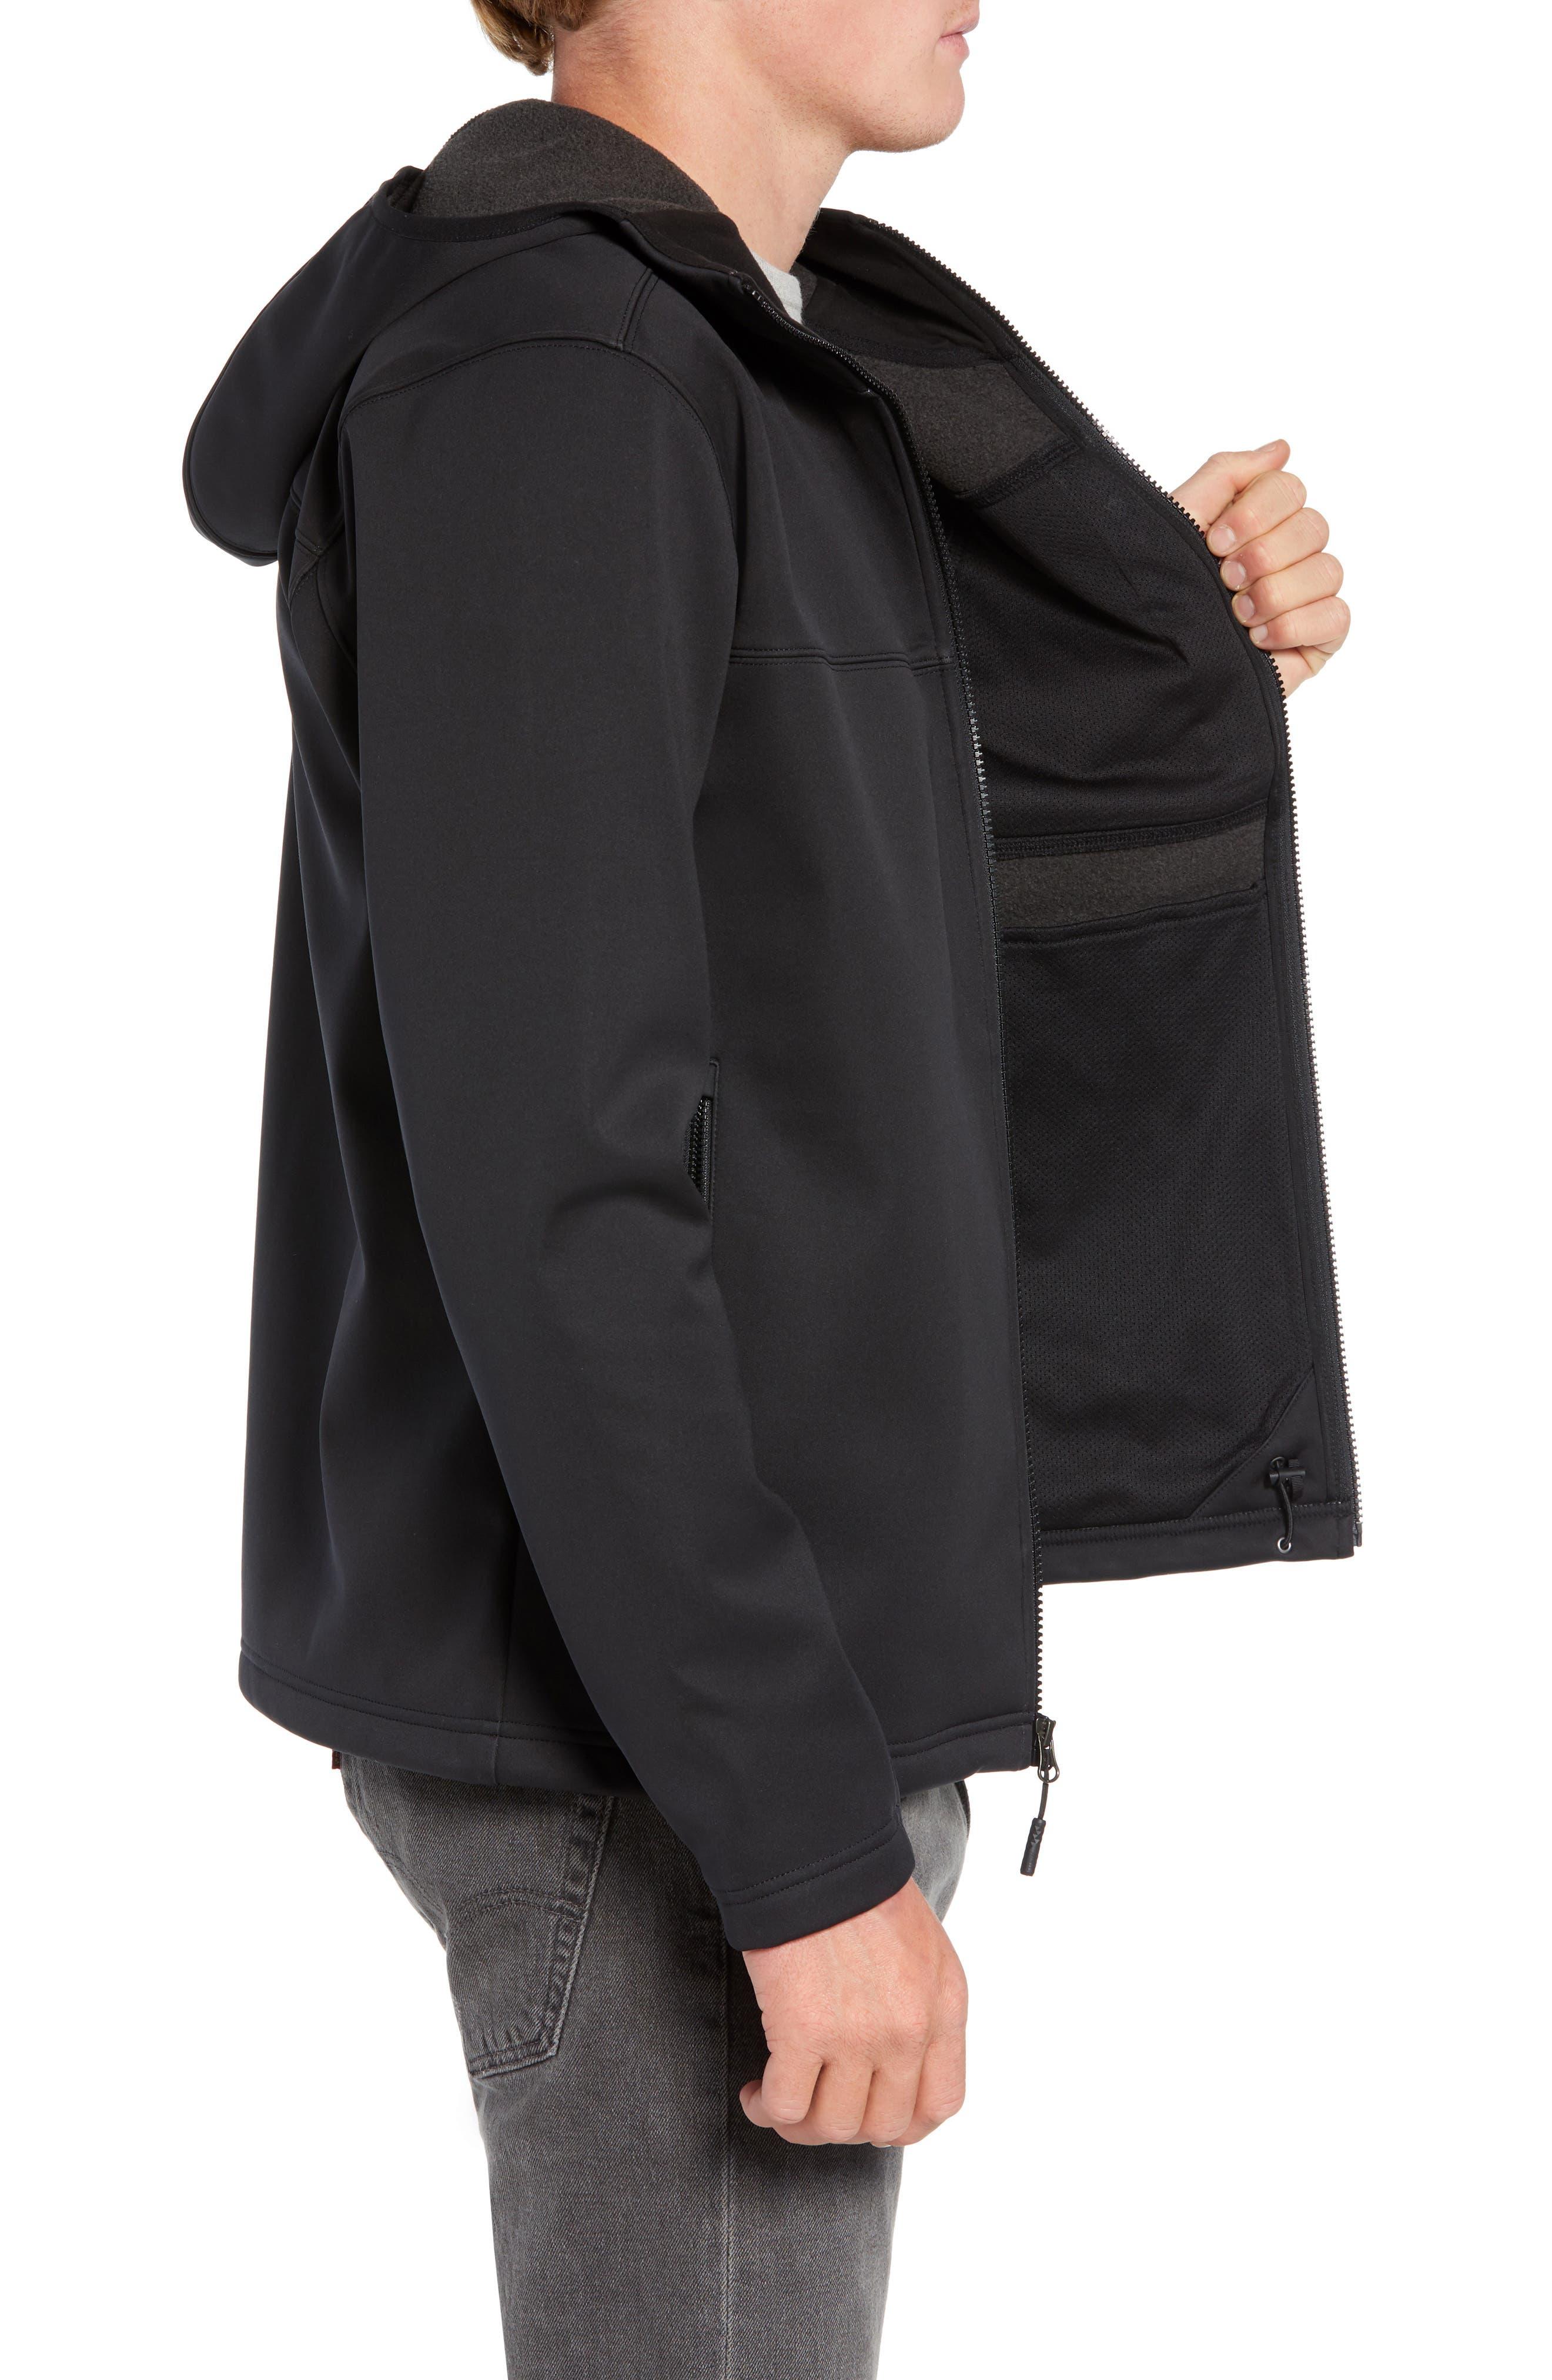 THE NORTH FACE,                             North Face Apex Risor Hooded Jacket,                             Alternate thumbnail 4, color,                             TNF BLACK/ TNF BLACK